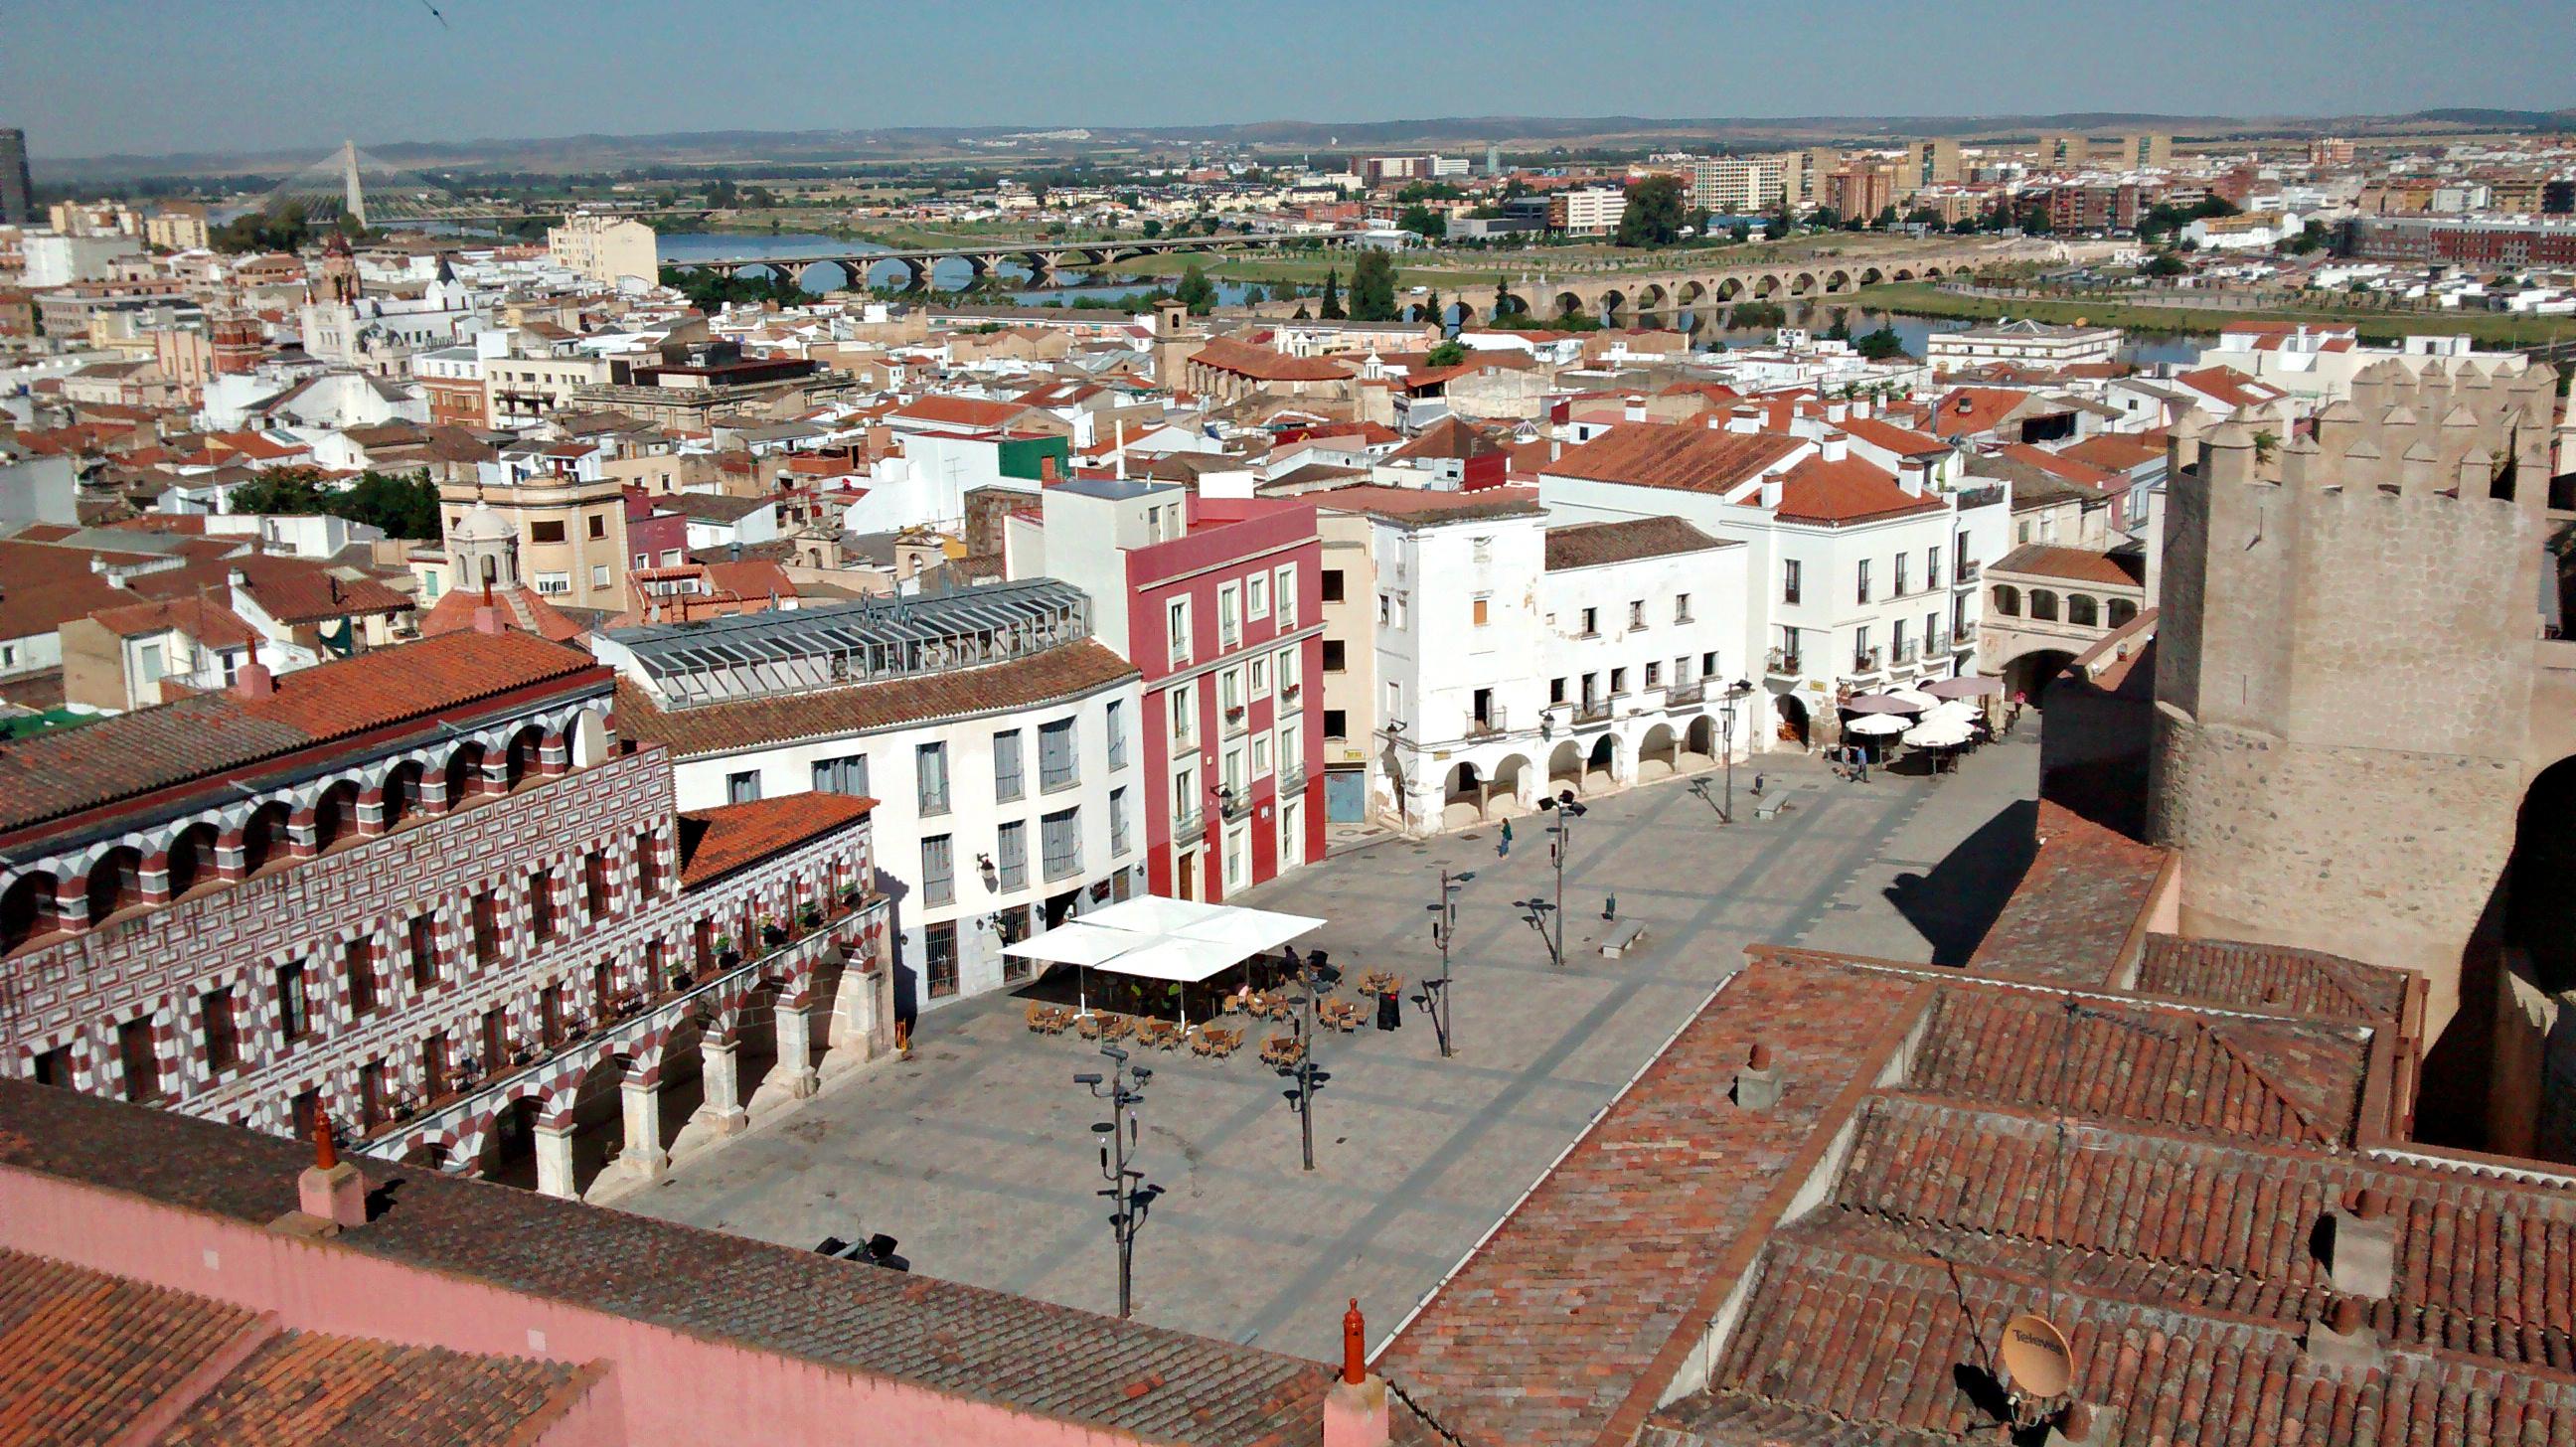 File:Badajoz desde la Torre de Espantaperros.jpg - Wikimedia Commons